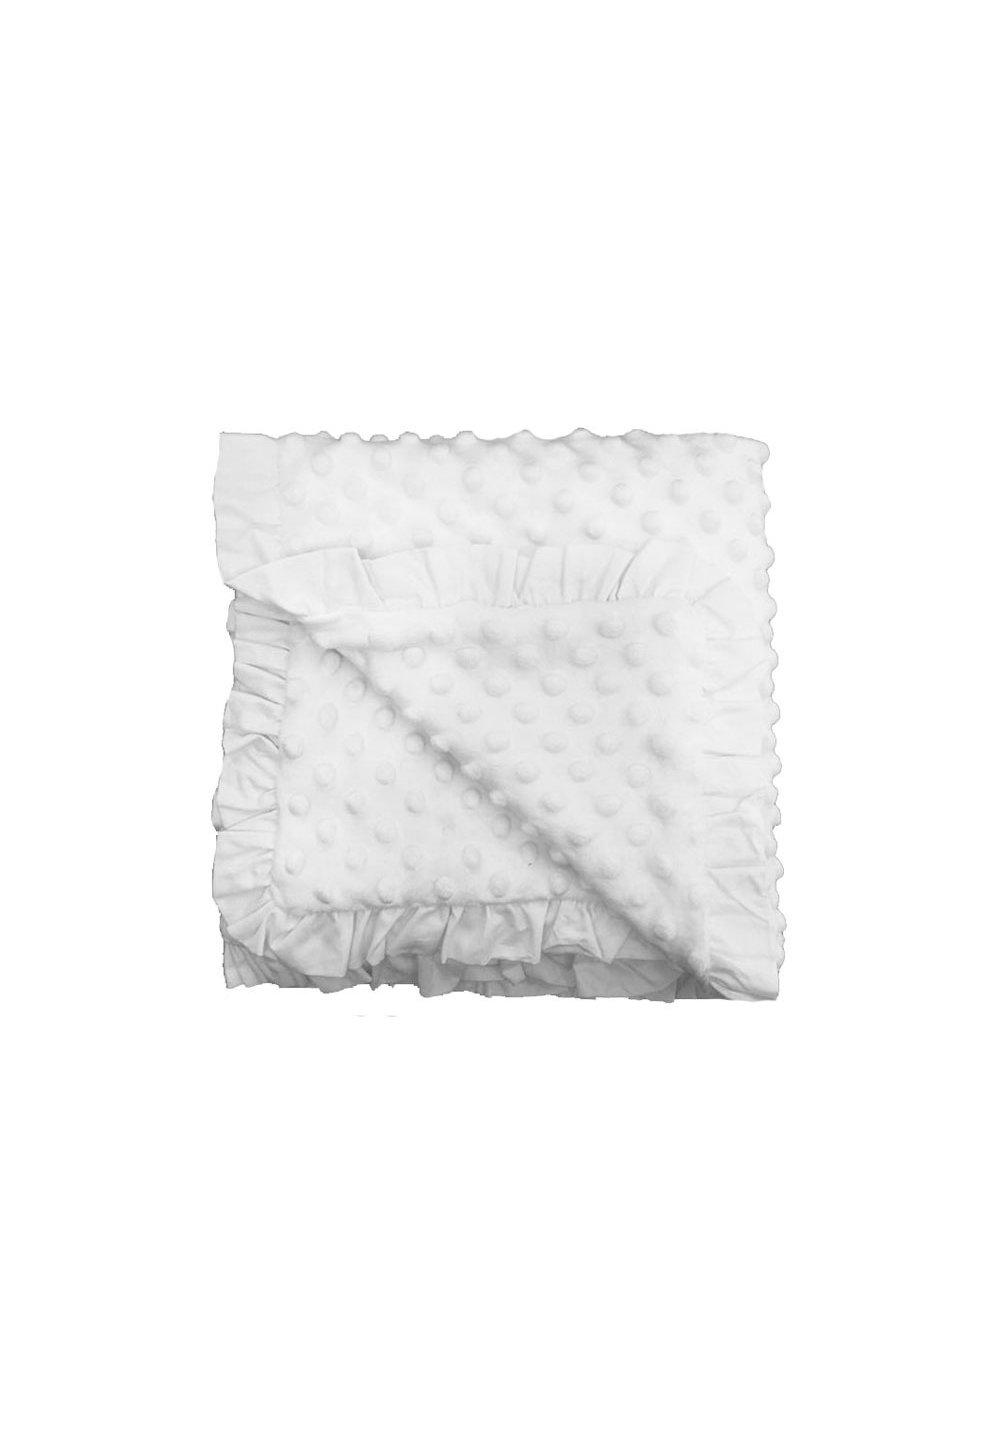 Paturica soft dubla, alba, 80x100cm imagine